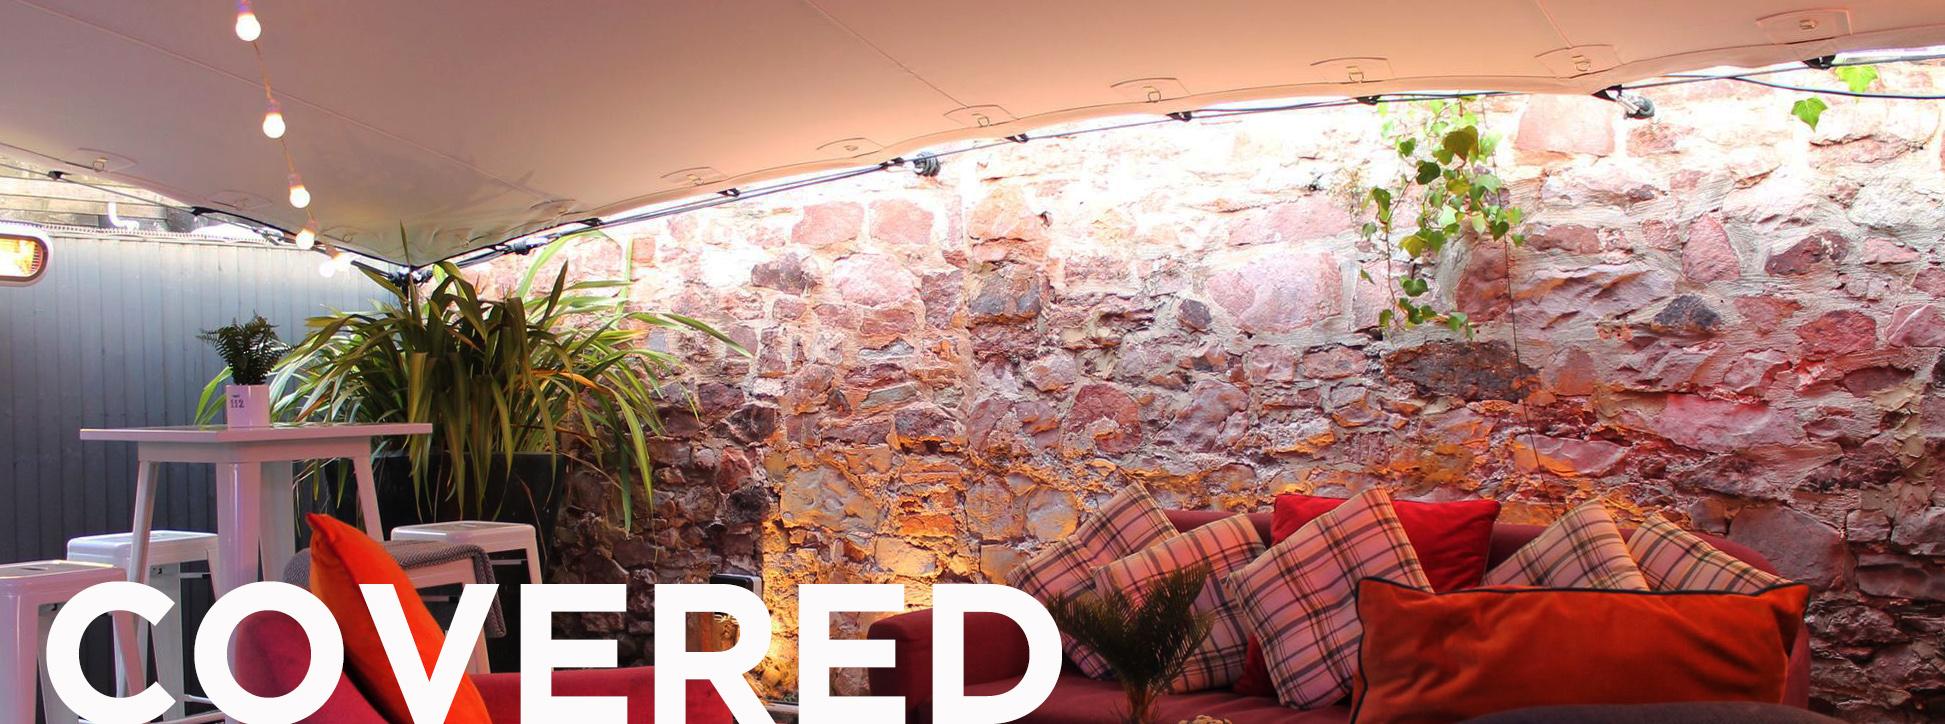 covered-terrace-bristol